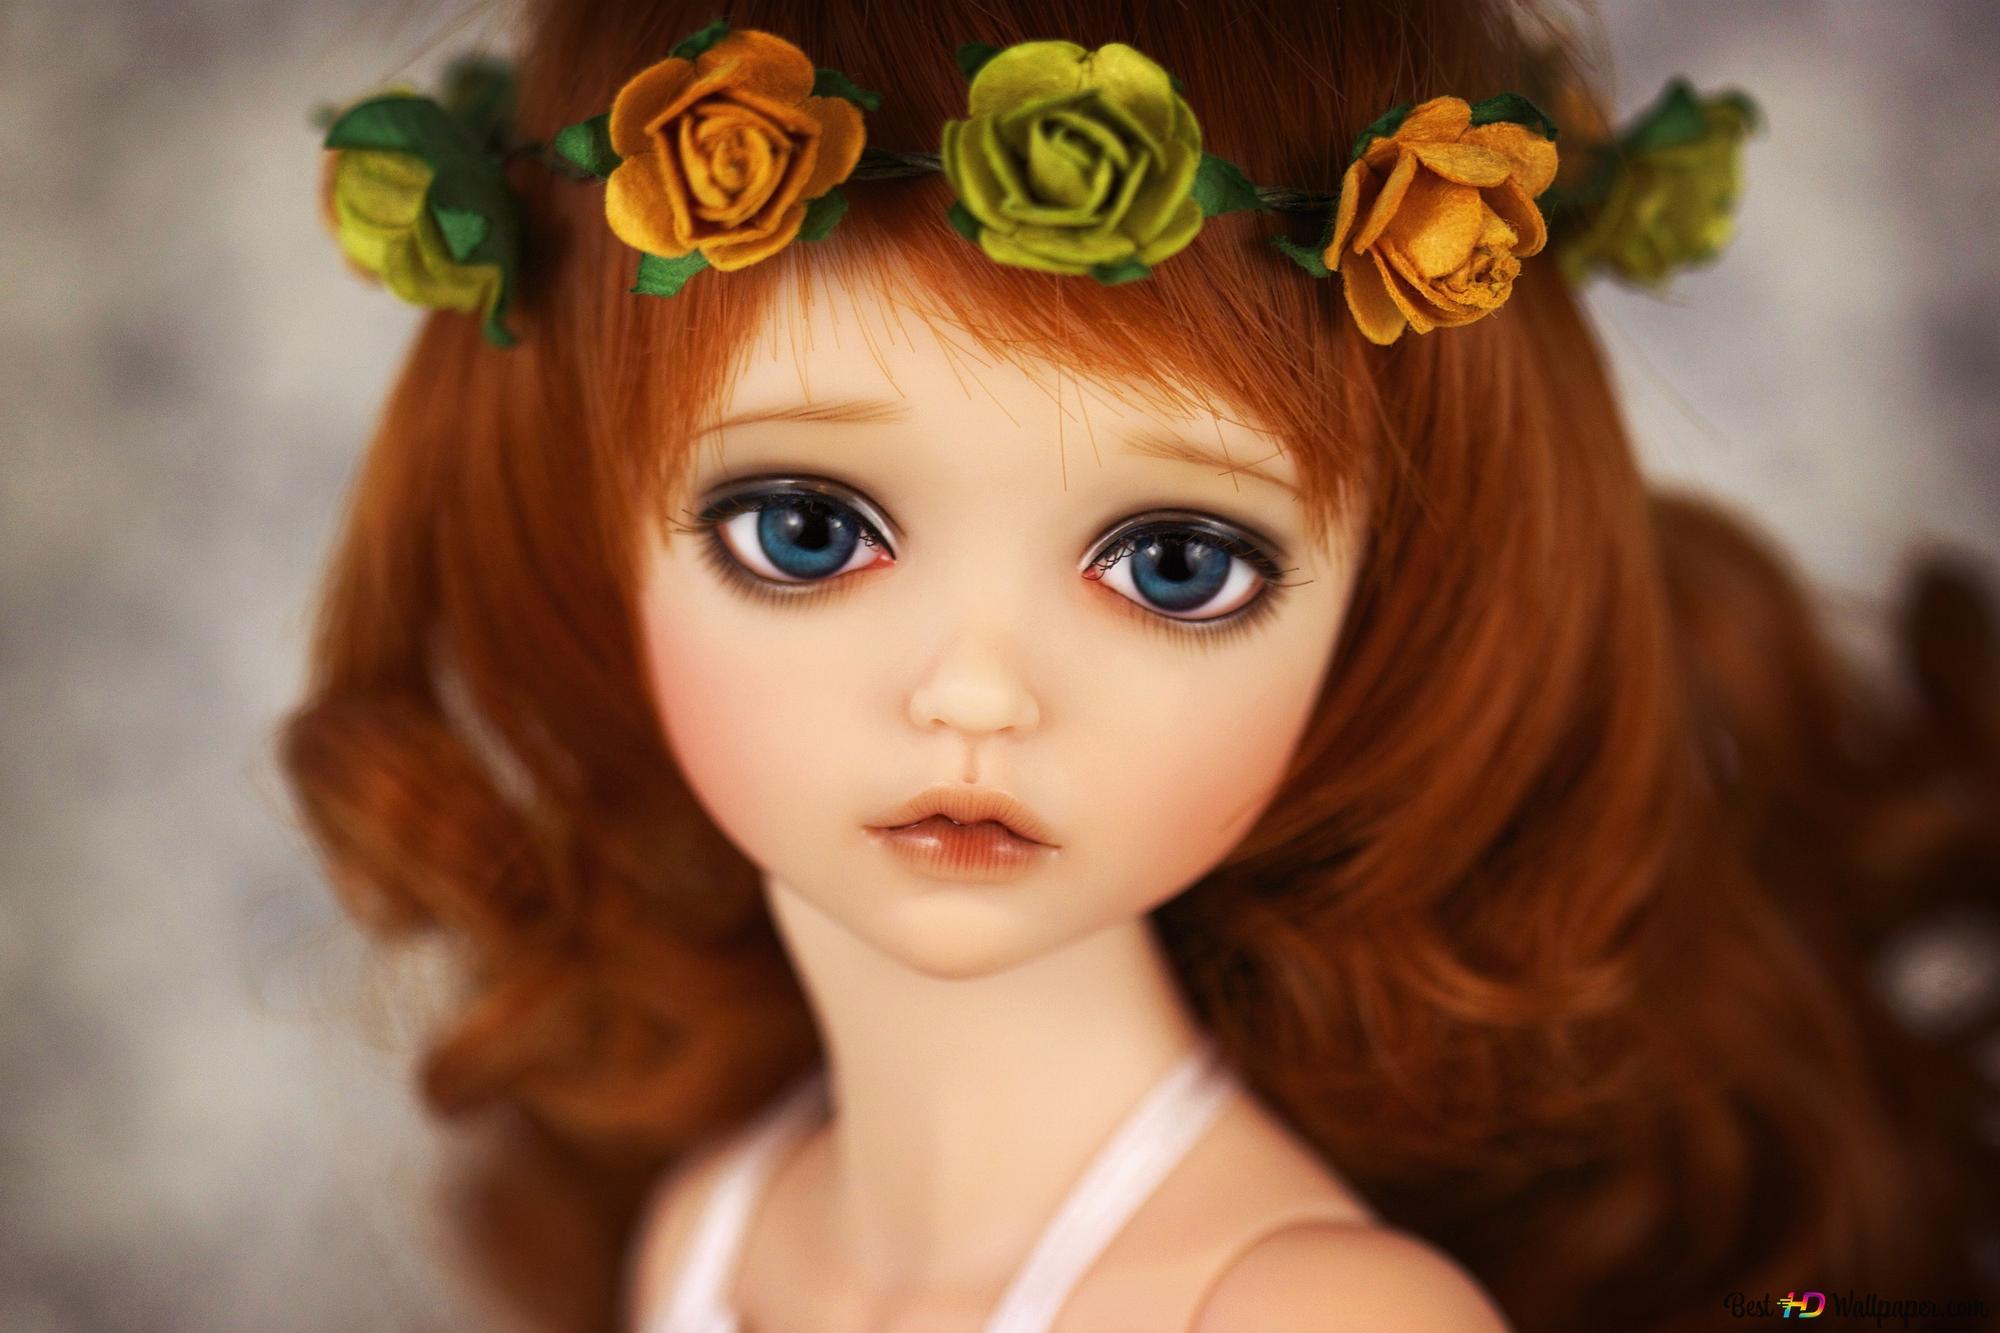 Cute Doll HD wallpaper download